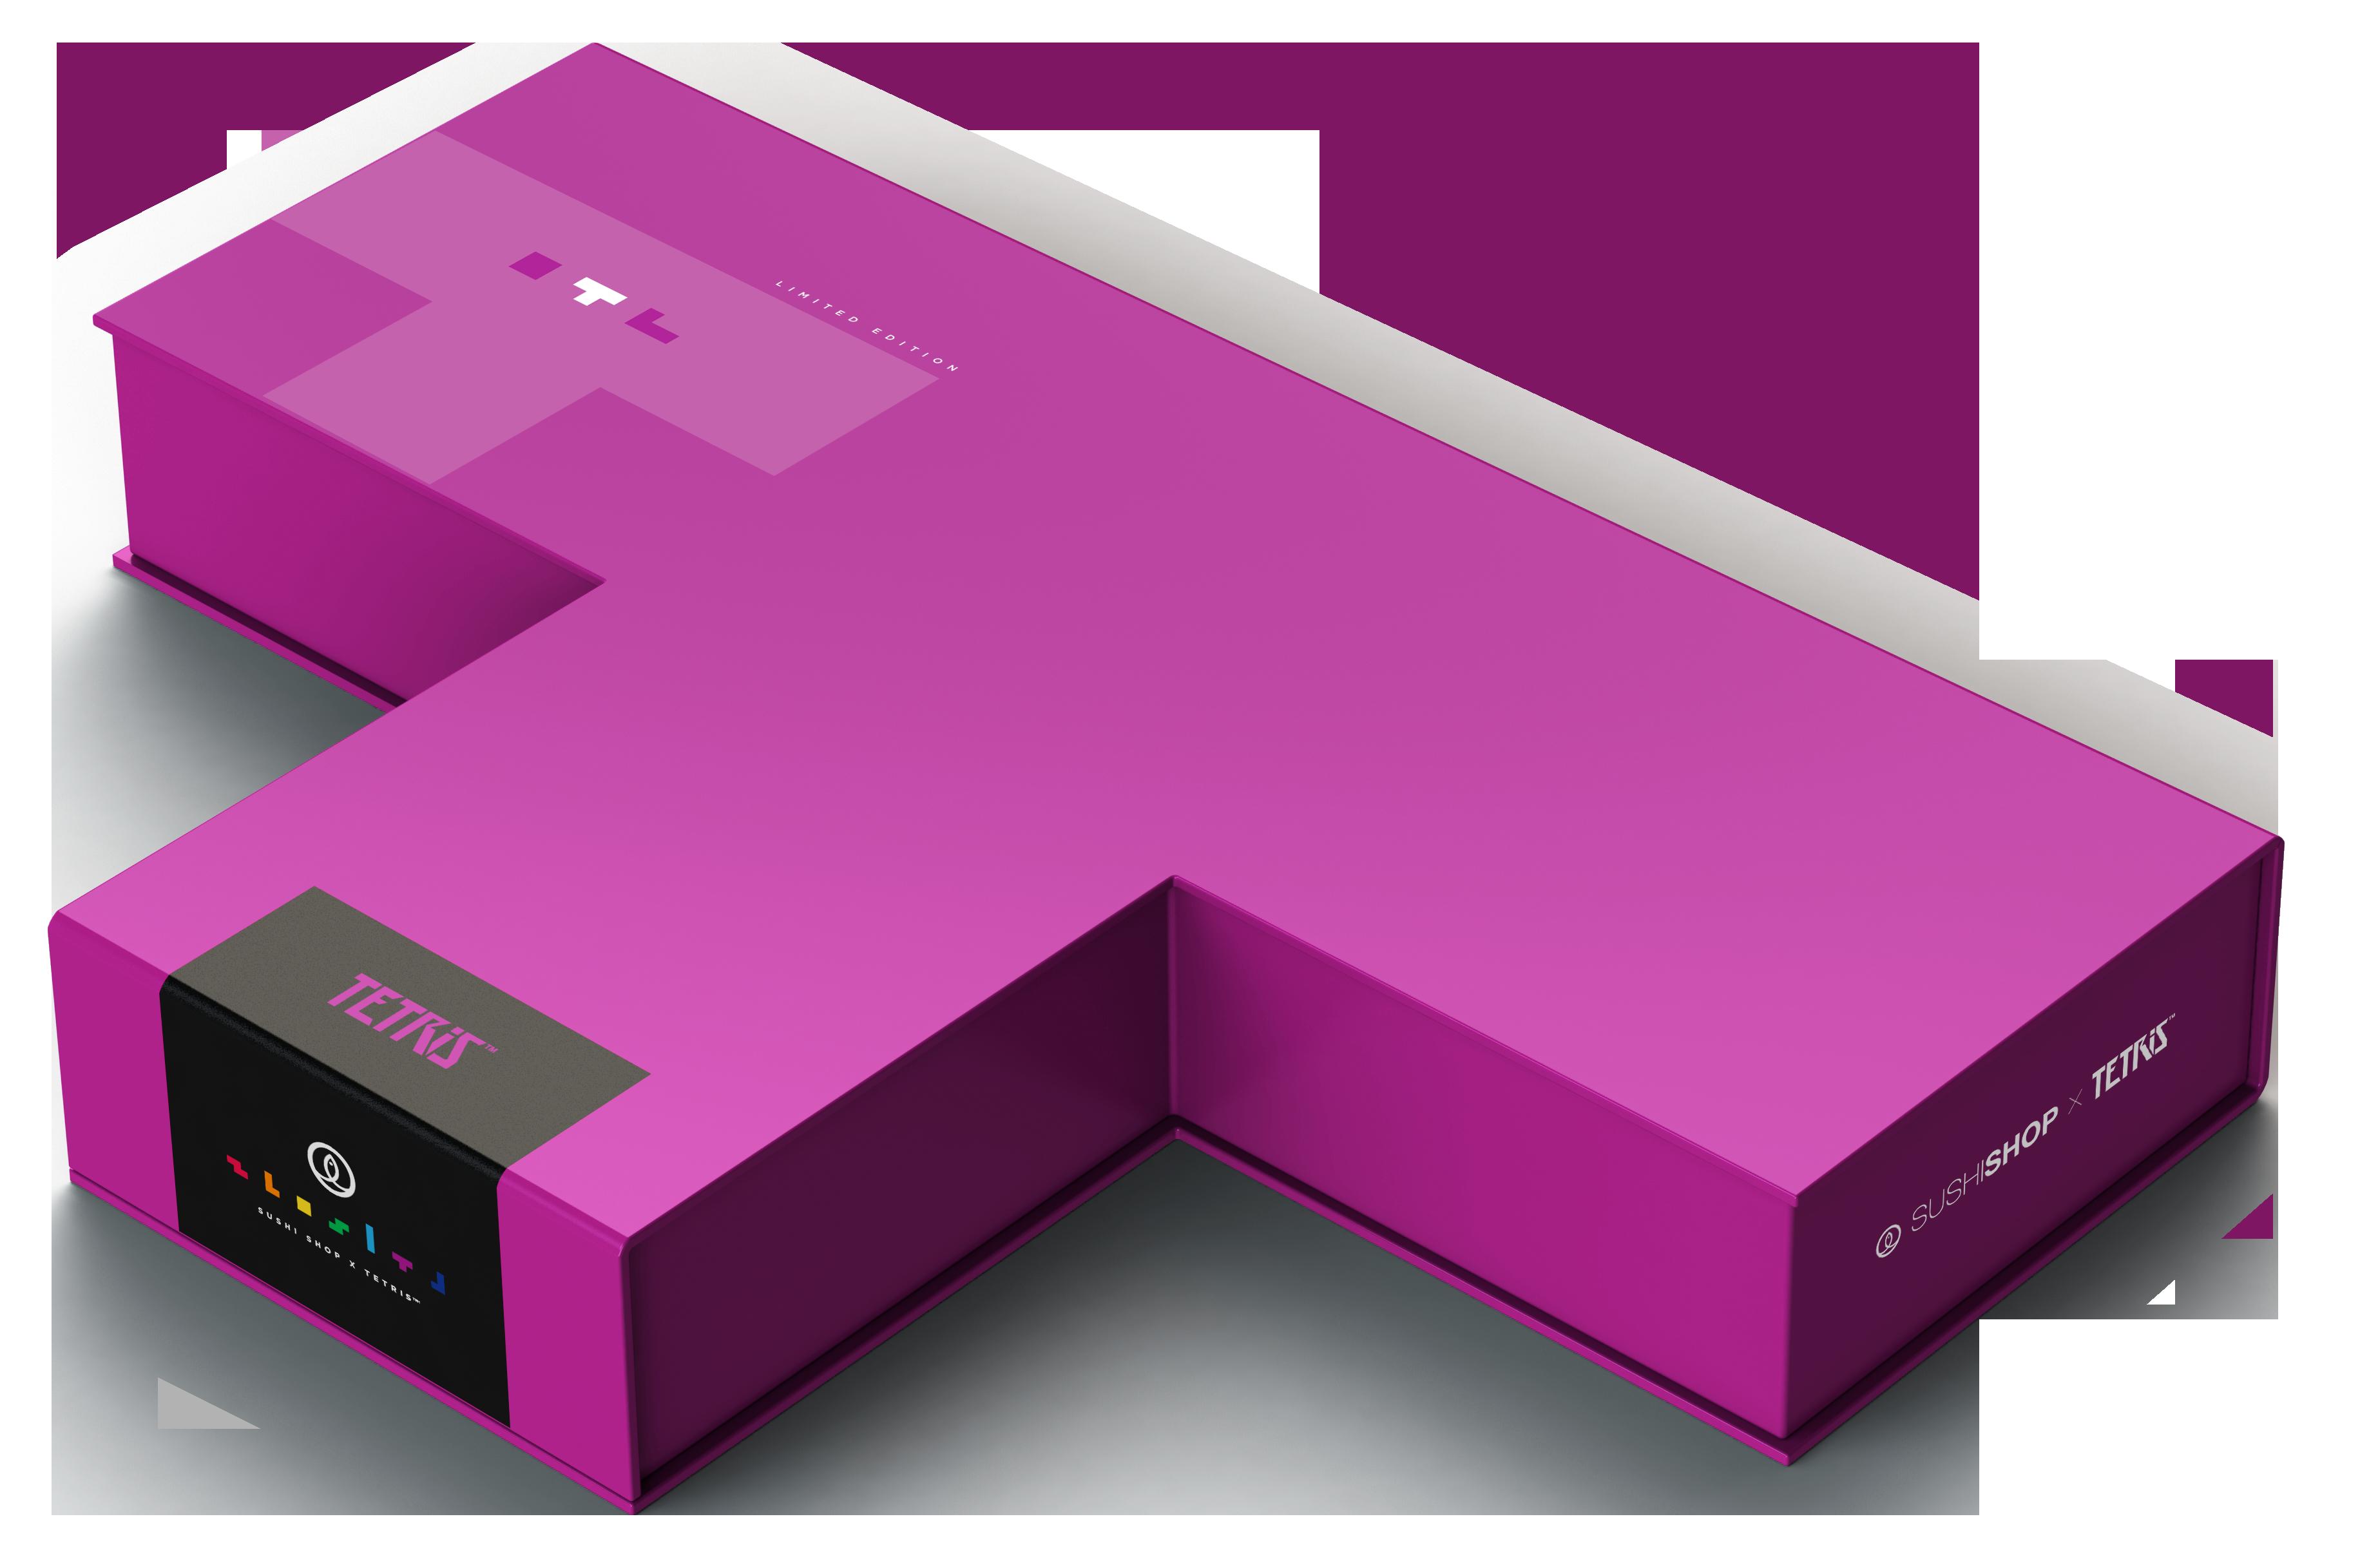 box_t_fermee_detouree_hd.png